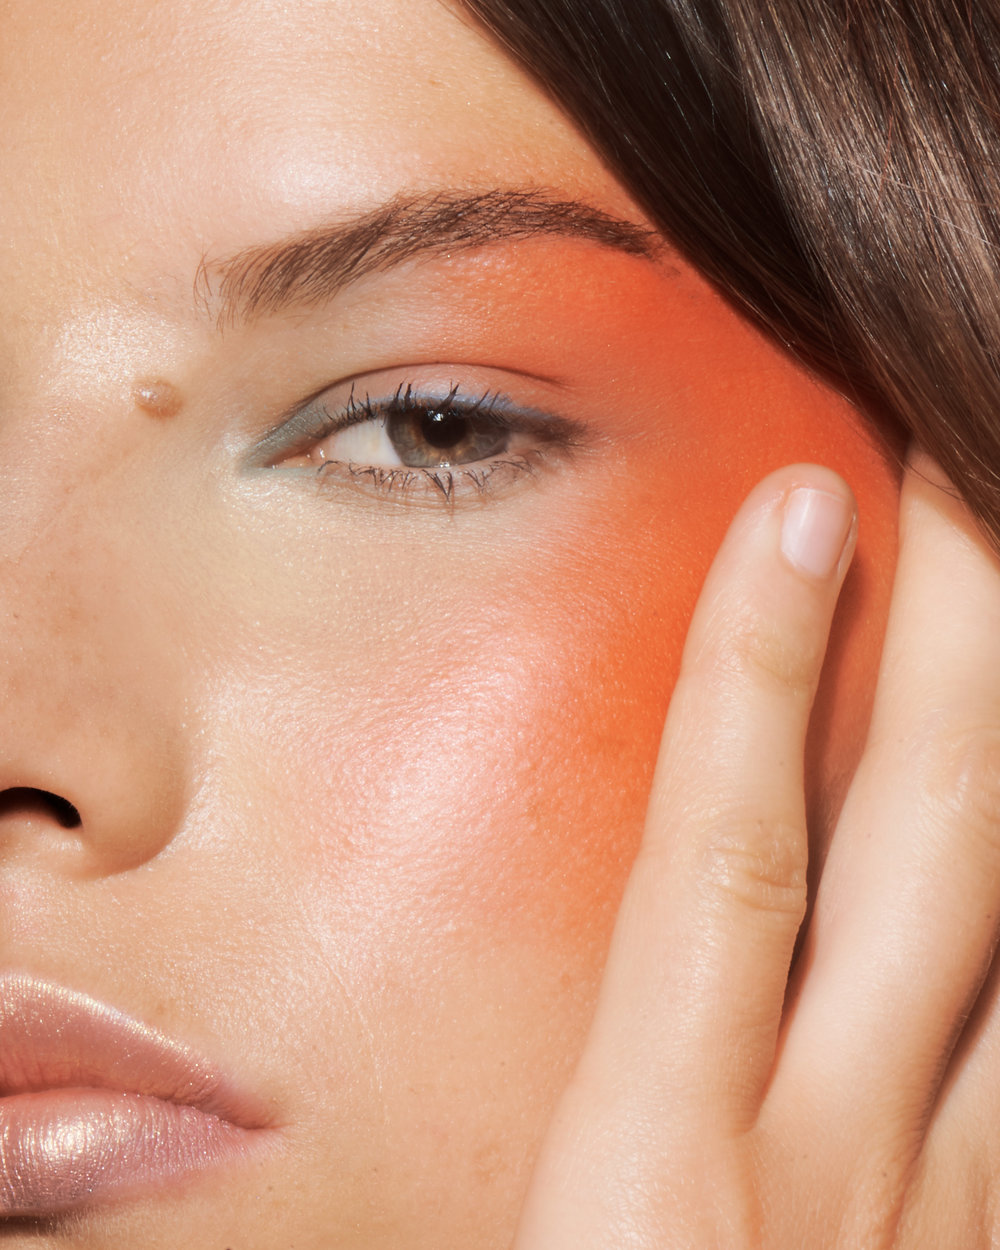 10-lea-schwarz-from-dulcedo-models-shot-by-photographer-matthew-parisien-makeup-by-emilie-mah-glam-styling-by-lori-meyers.jpg